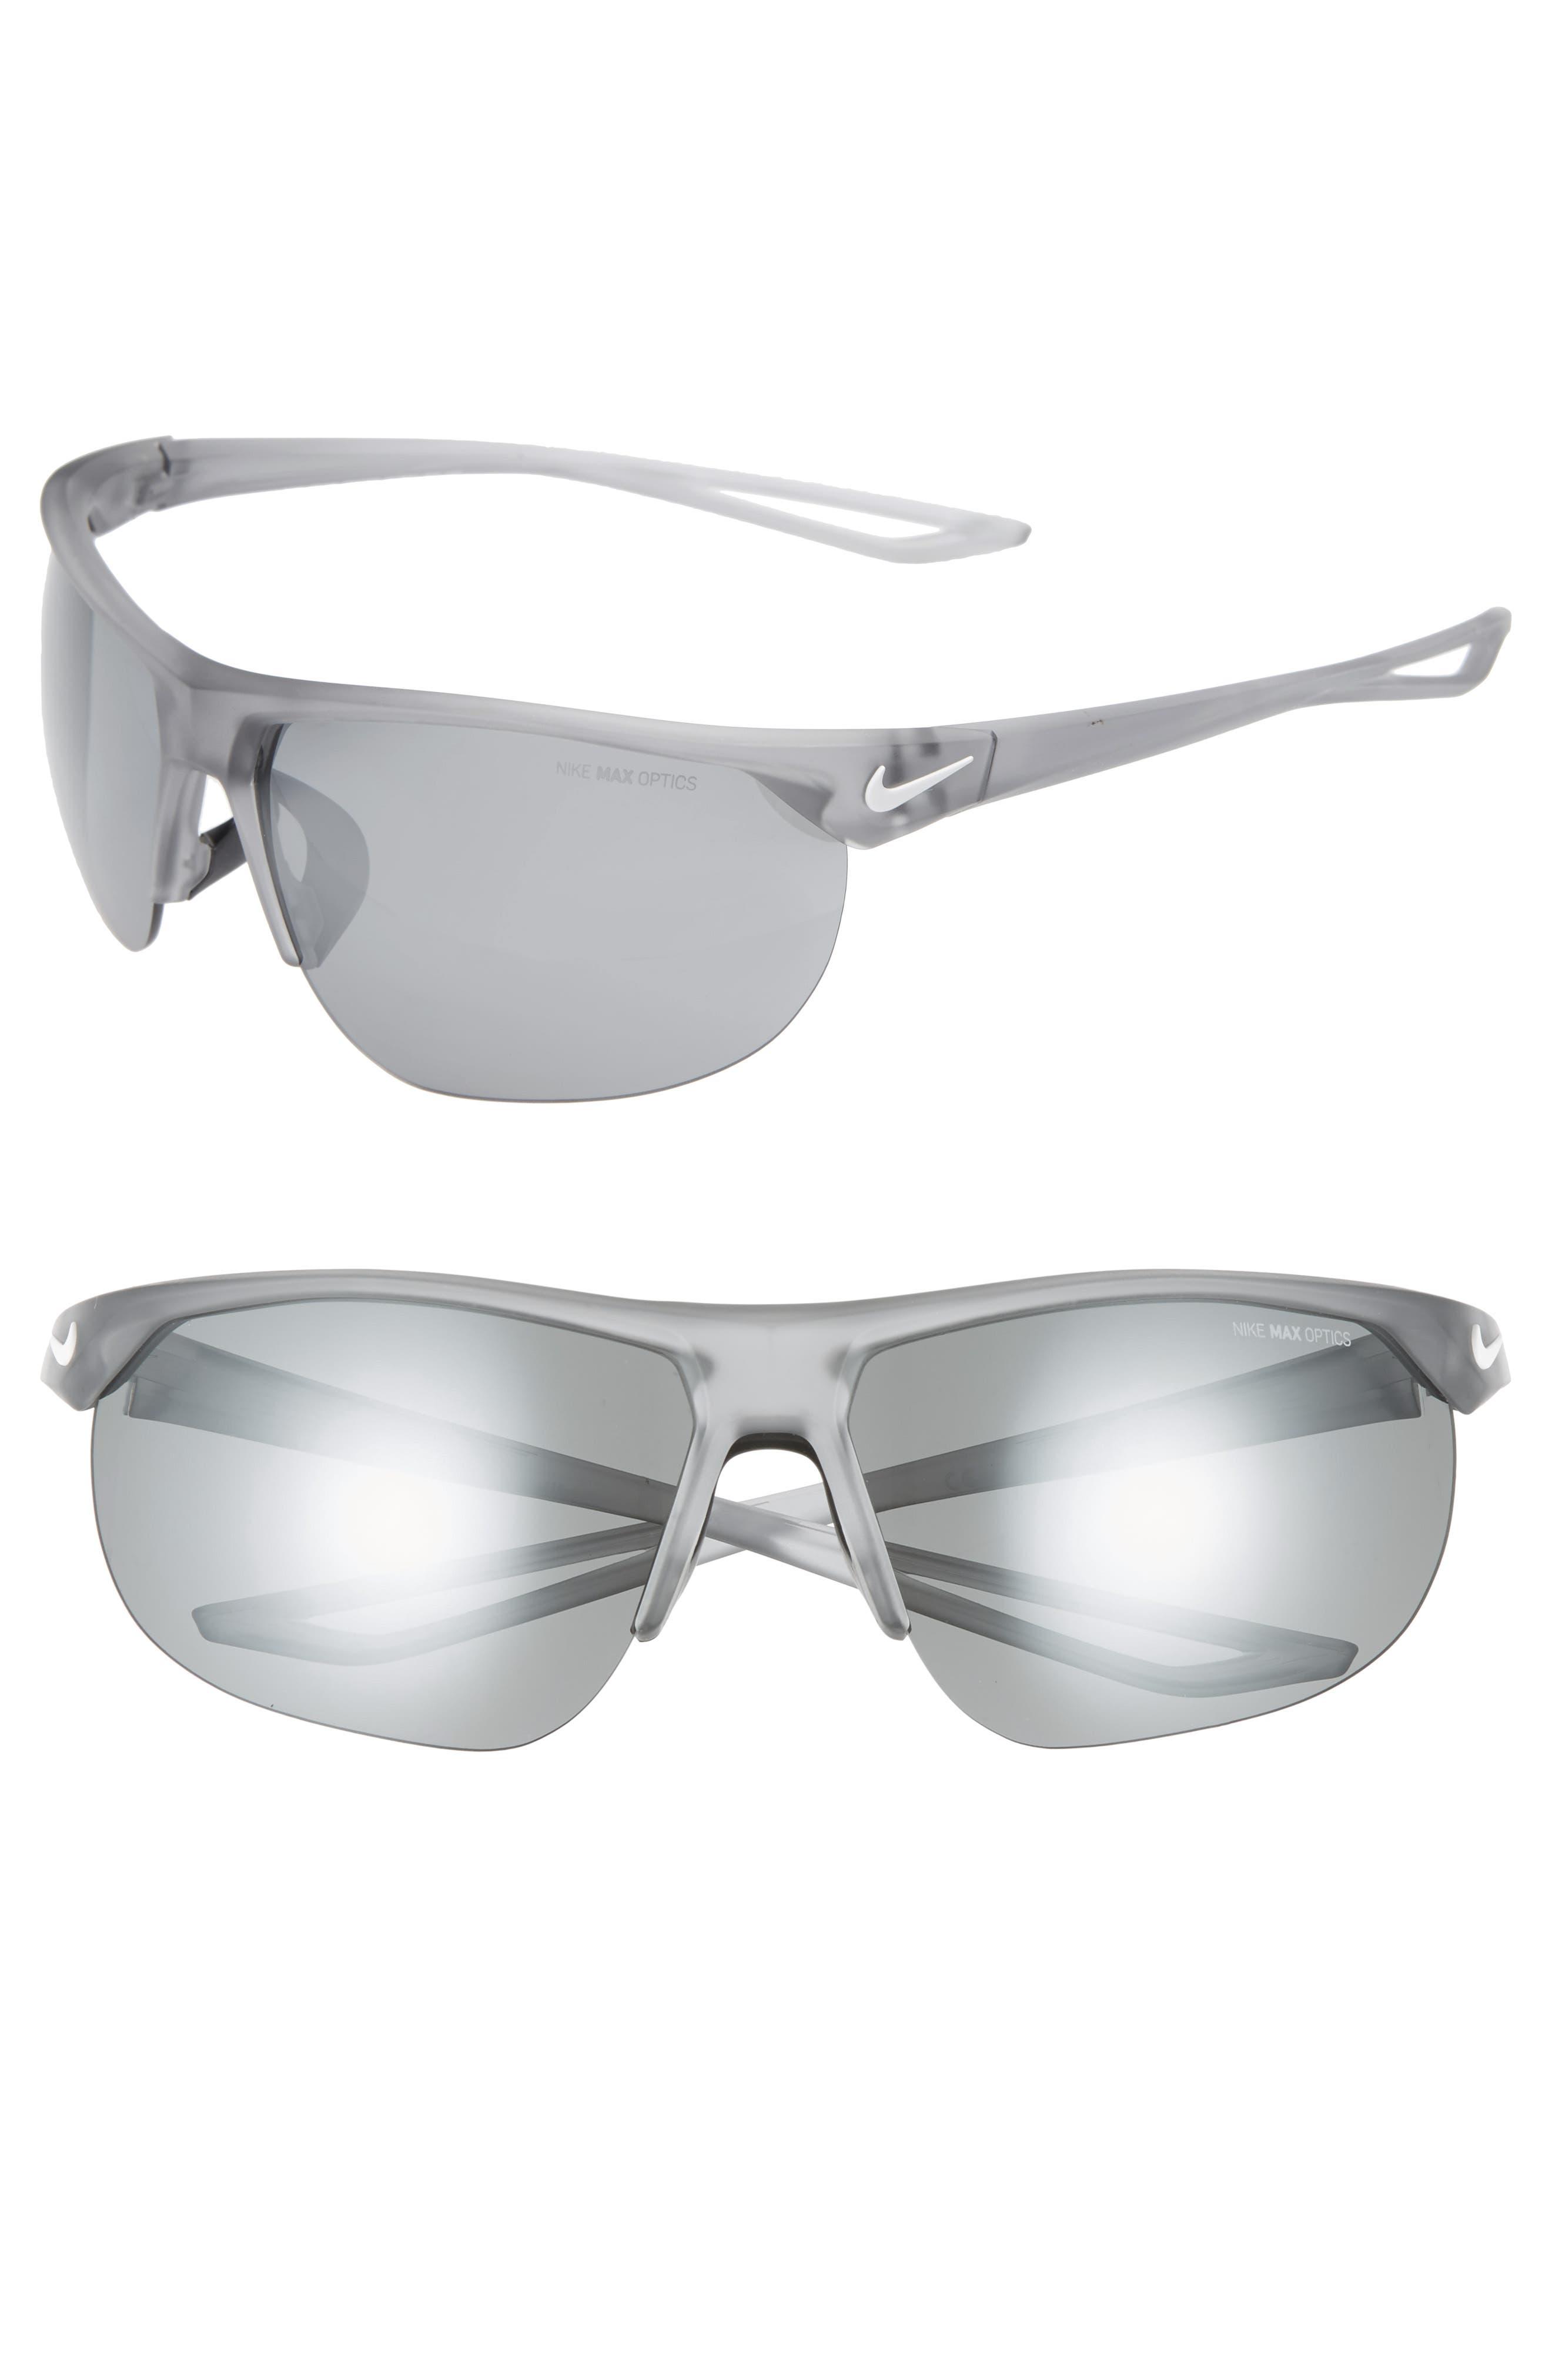 Nike Cross Trainer 67Mm Shield Sunglasses - Silver/ Matte Grey